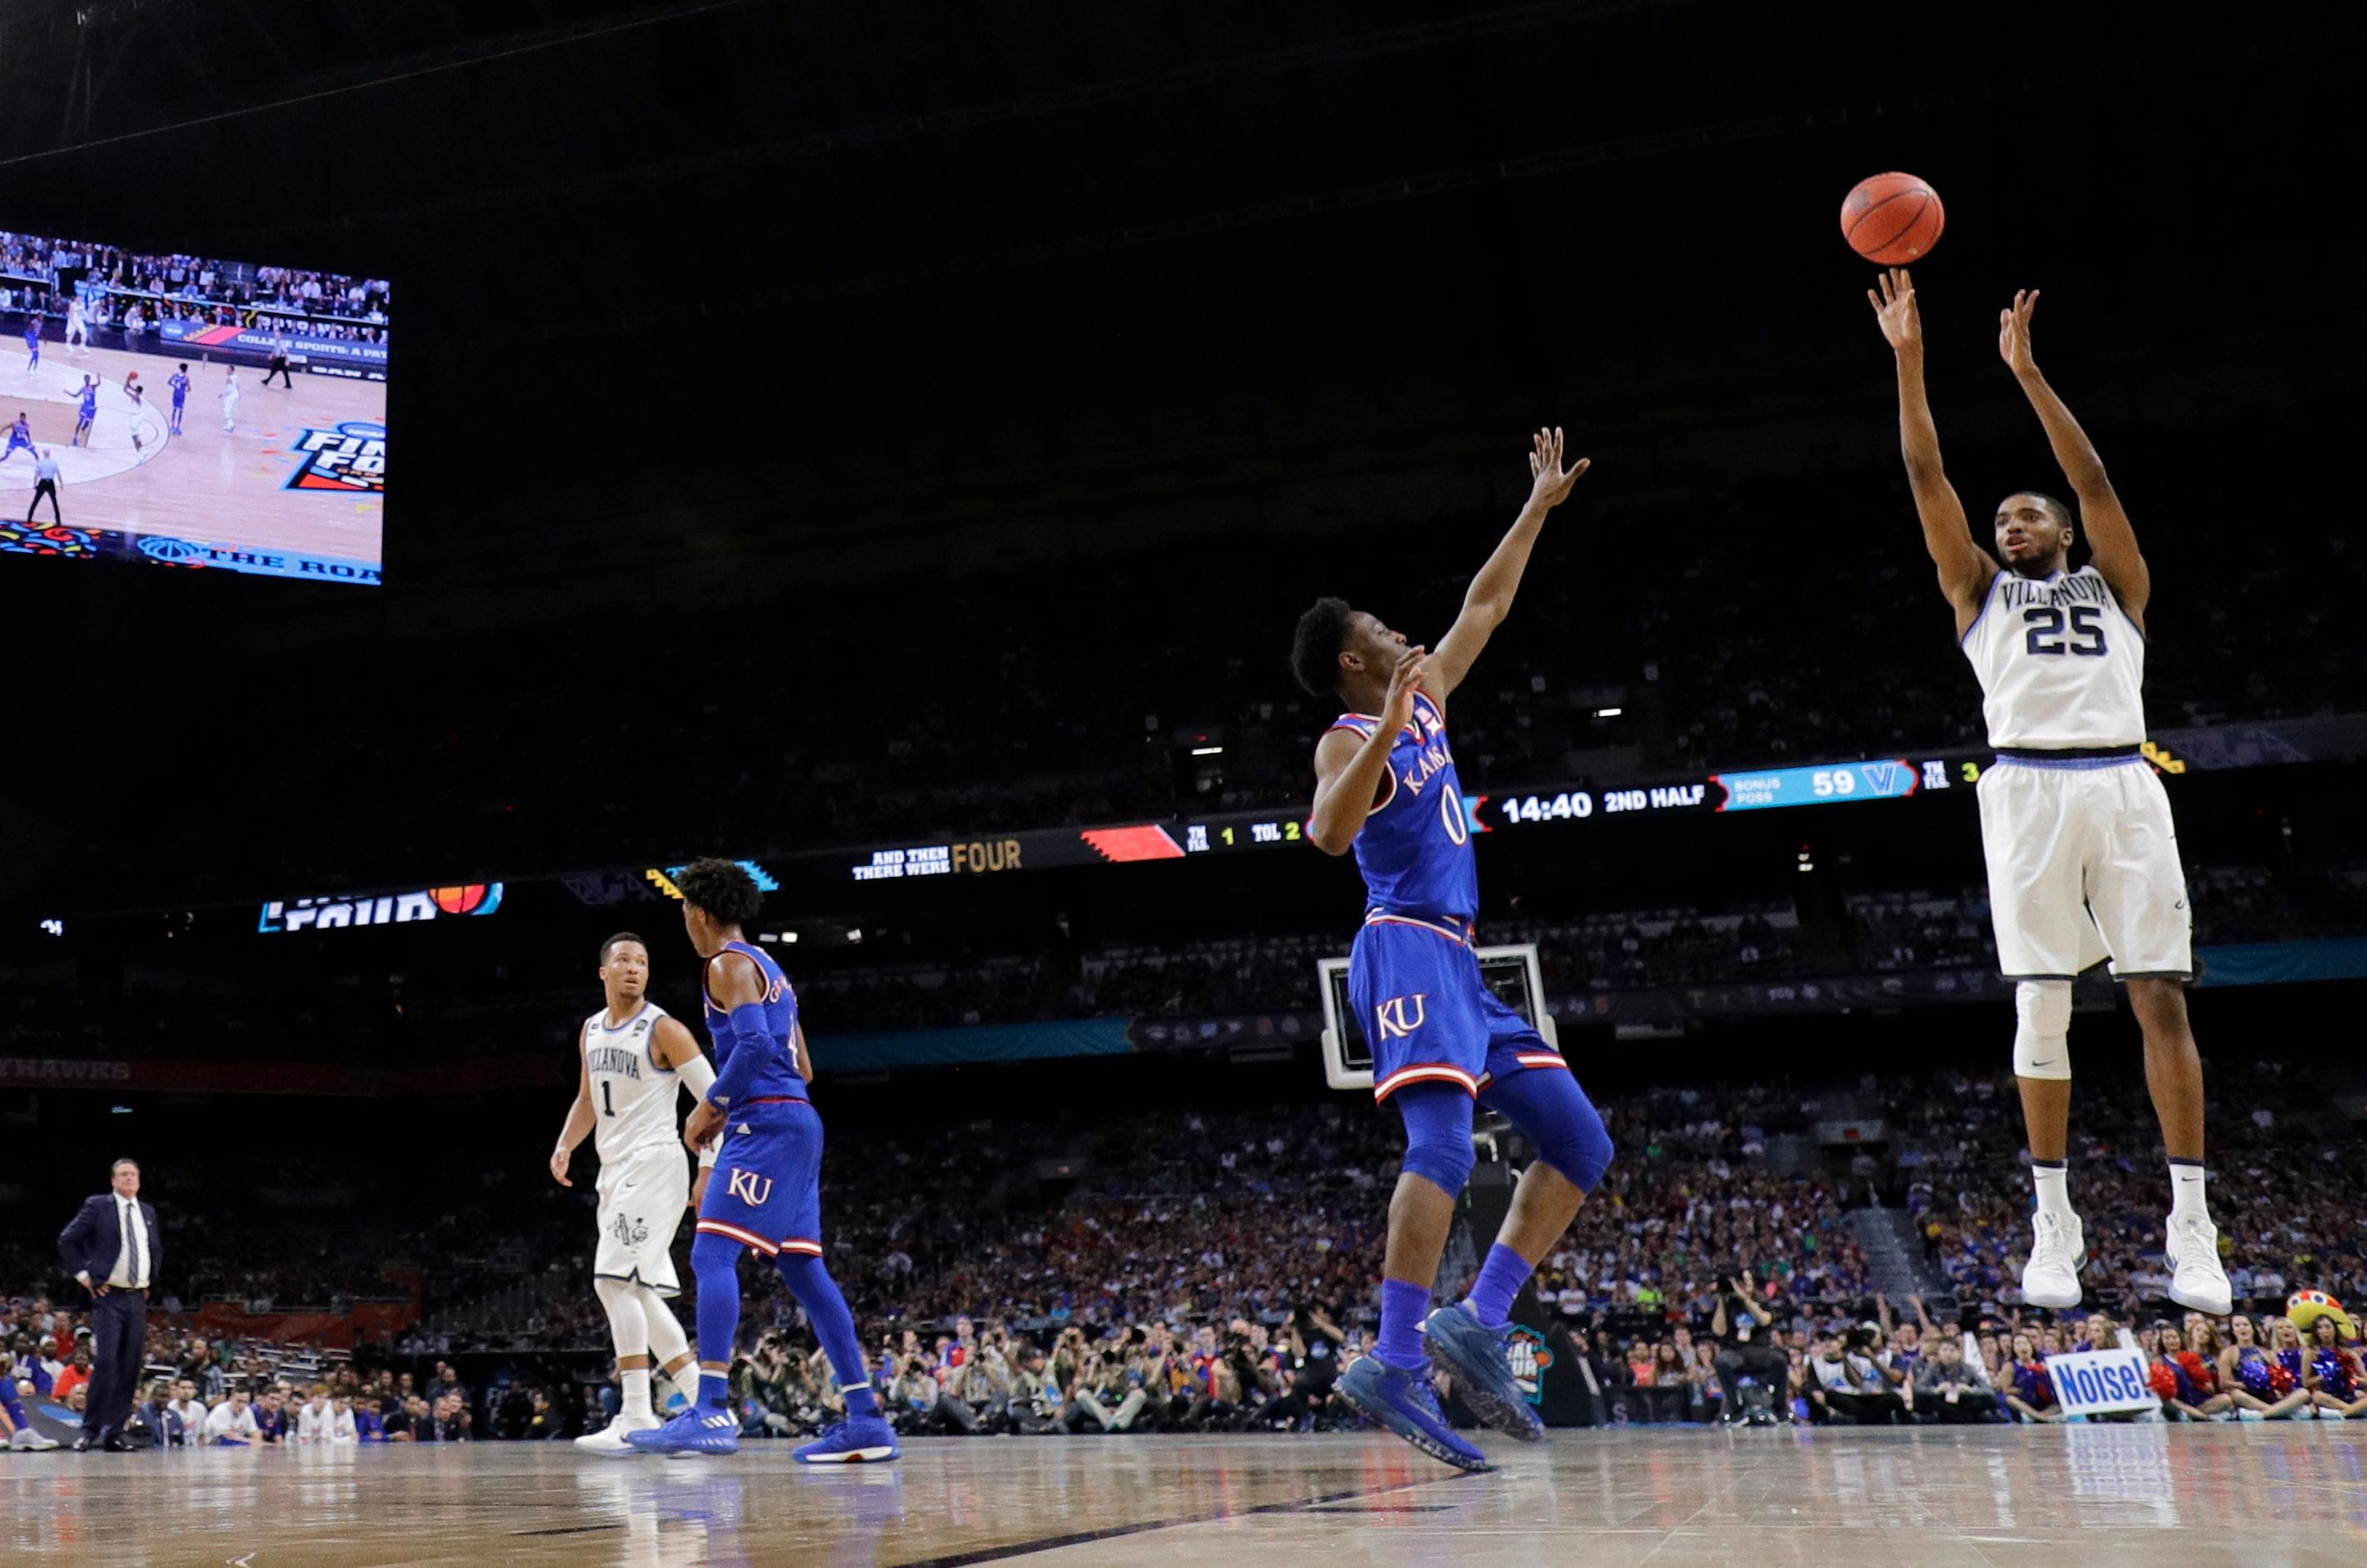 From Humble Beginnings 3 Point Shot Now The Key To A Title Hand Grip Kansa Busa Villanovas Mikal Bridges 25 Shoots Basket Against Kansas During